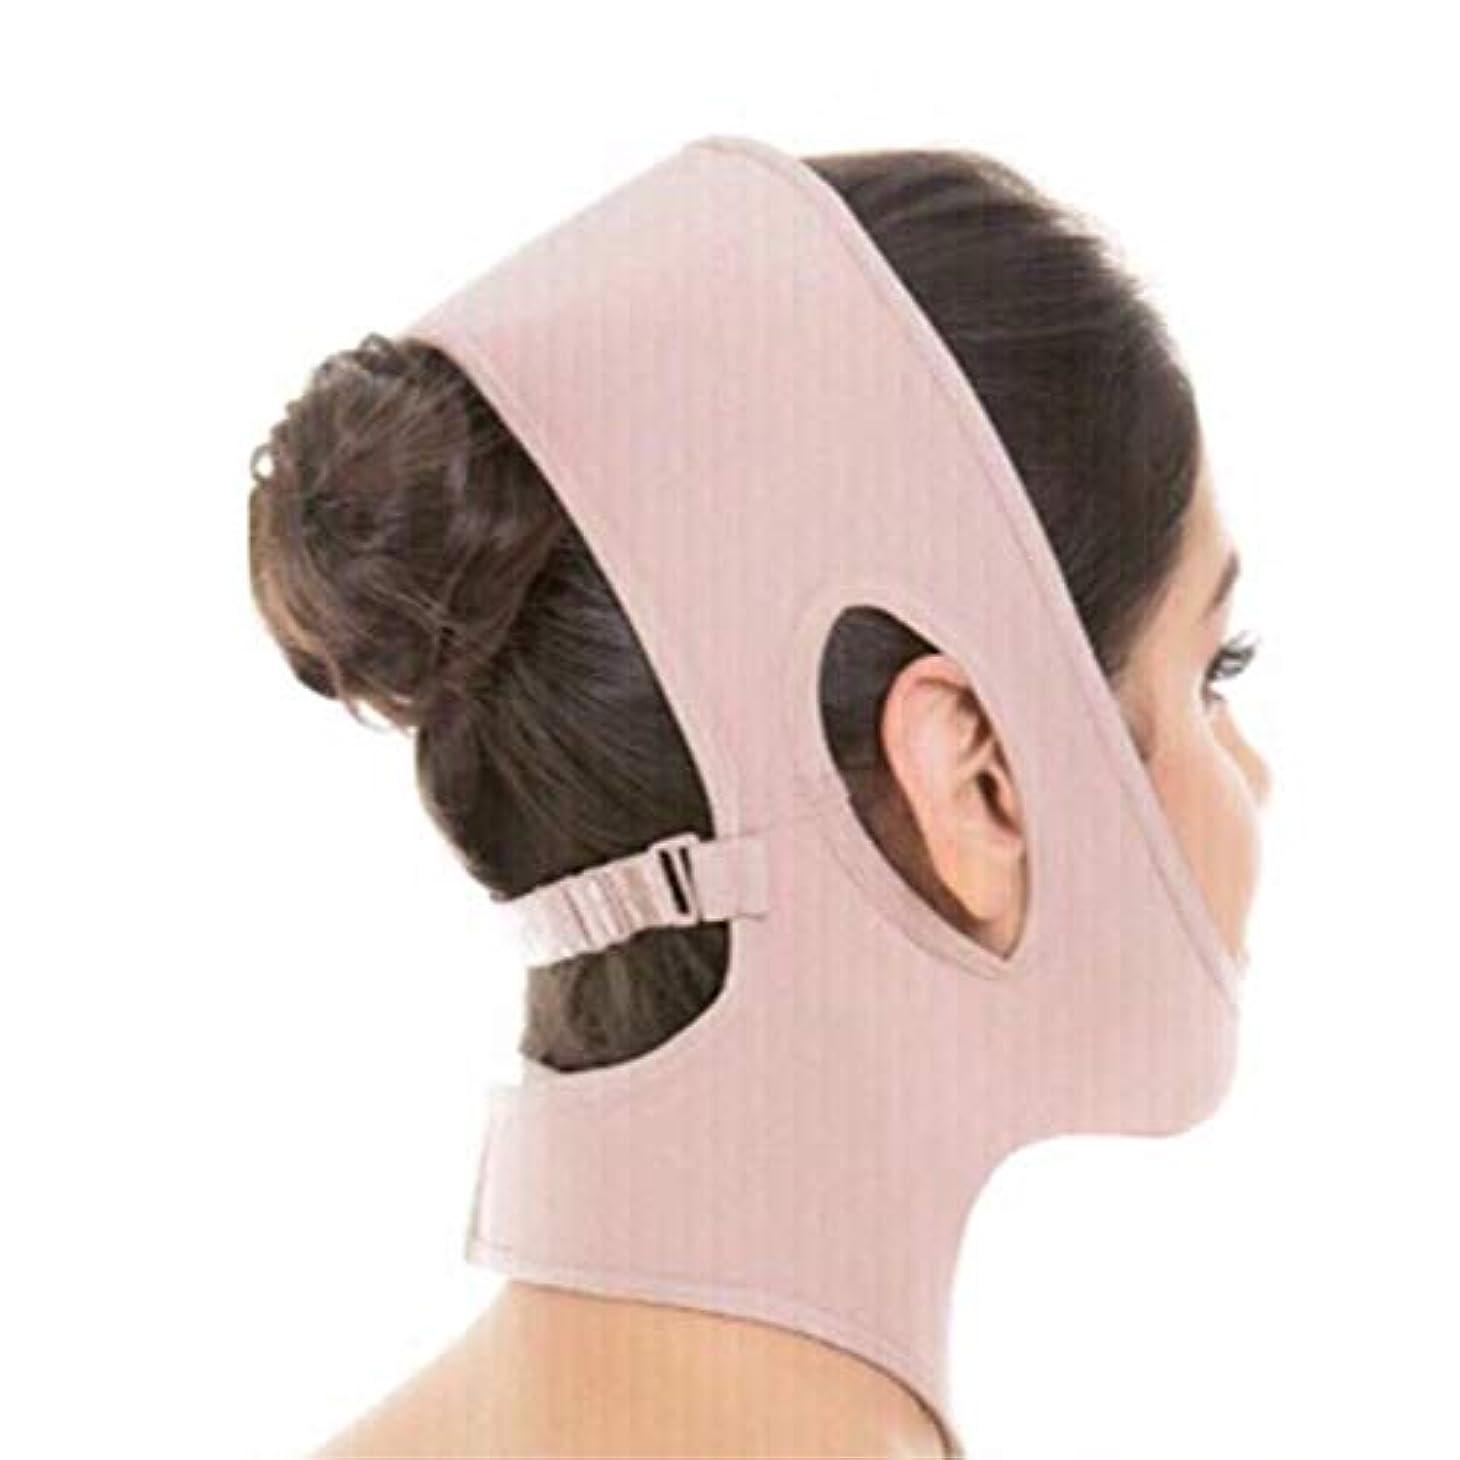 XHLMRMJ フェイスリフティング包帯、フェイスリフティングマスク、顔の皮膚の首と首を持ち上げる、二重あごを減らすために顔を持ち上げる(ワンサイズフィット) (Color : Khaki)